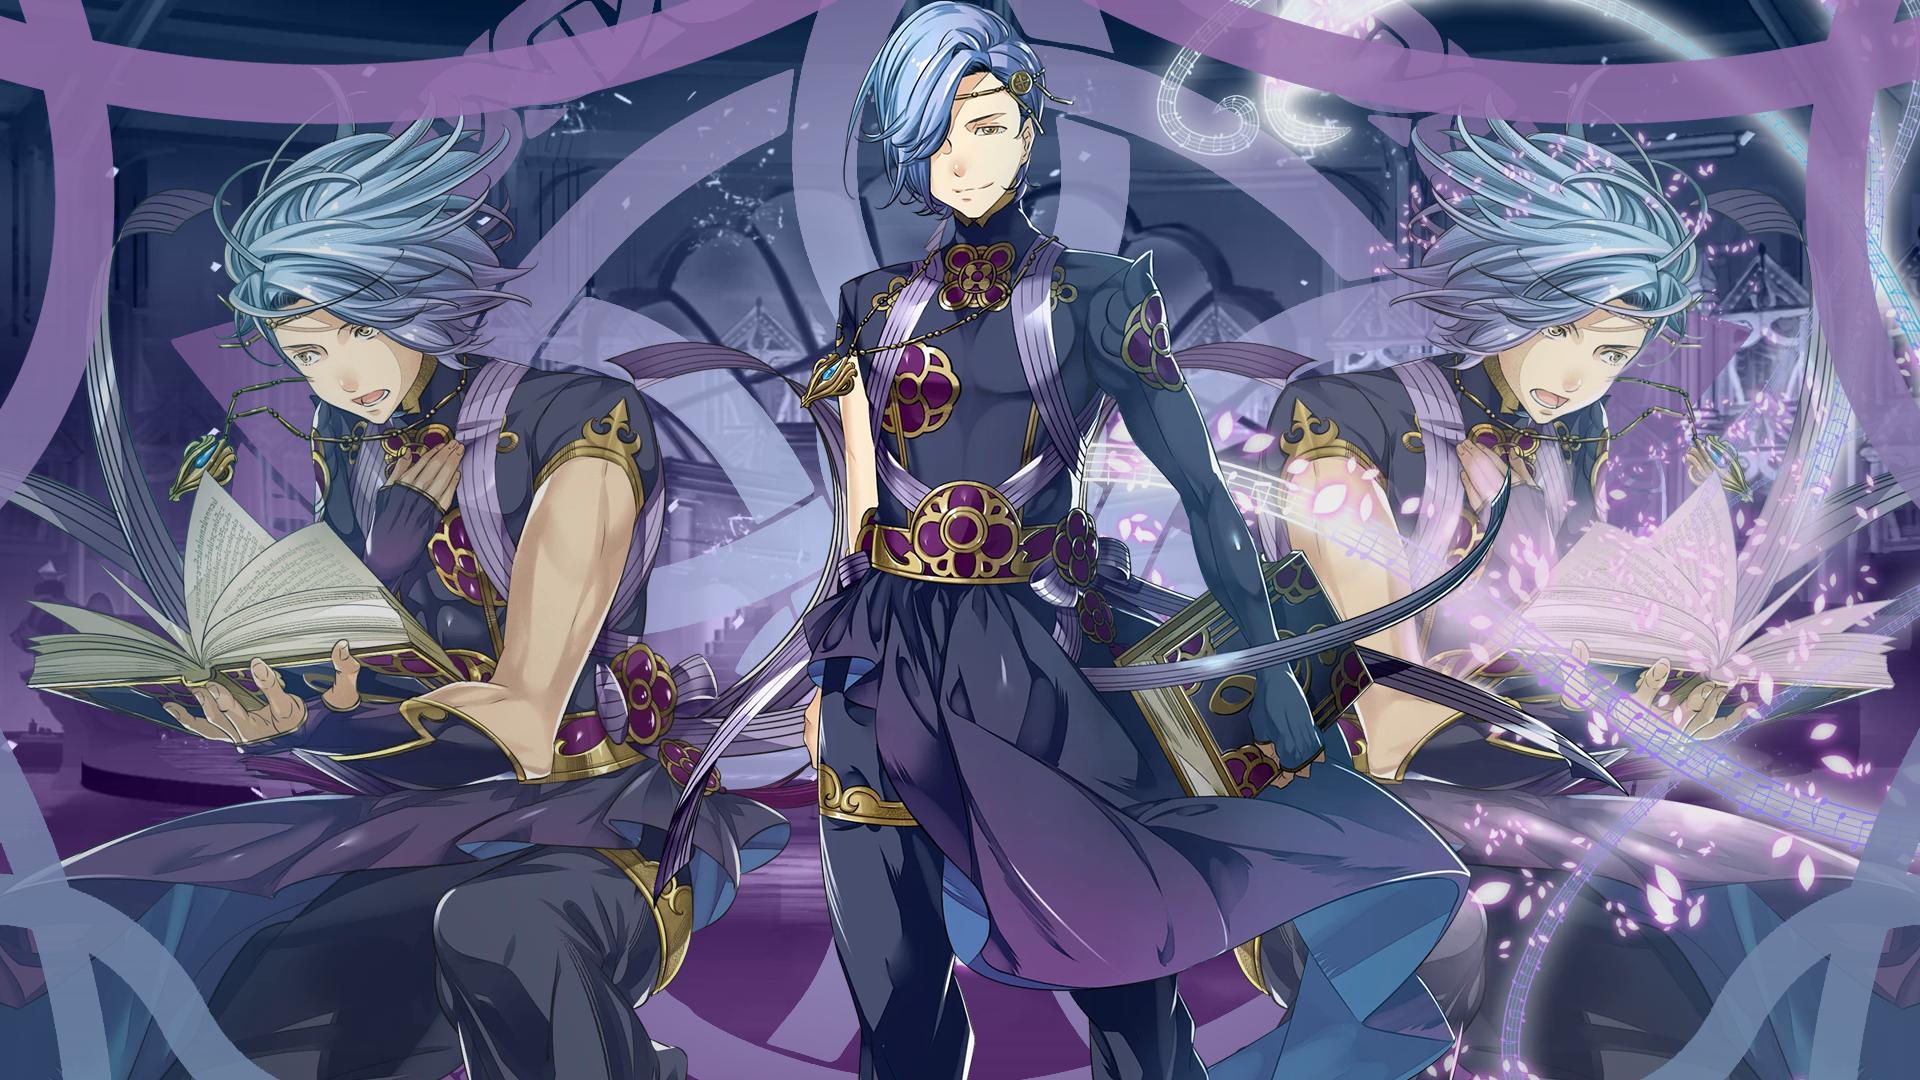 Shigure   Dark Sky Singer HD Wallpaper Background Image 1920x1080